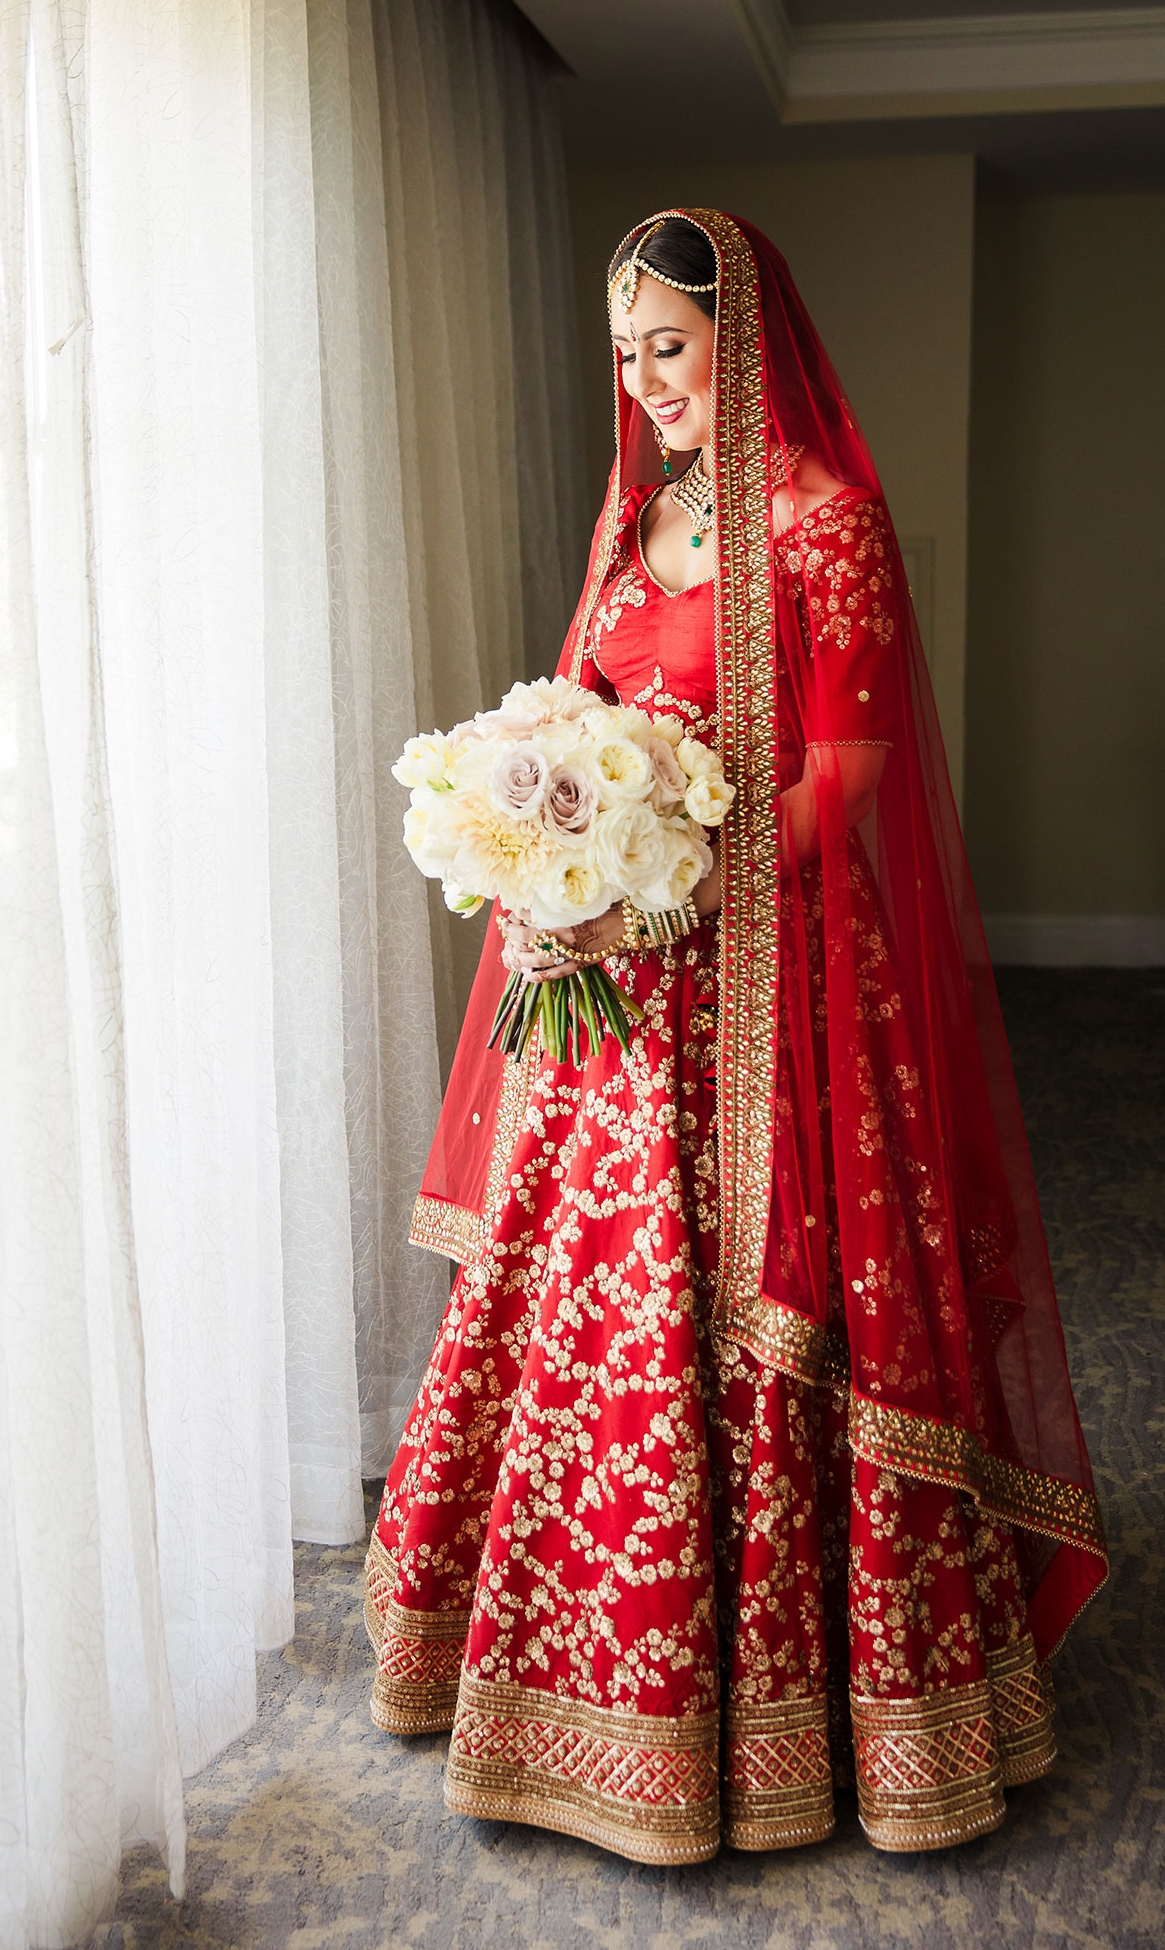 02-ritz-carlton-laguna-niguel-indian-wedding-photography-1.jpg